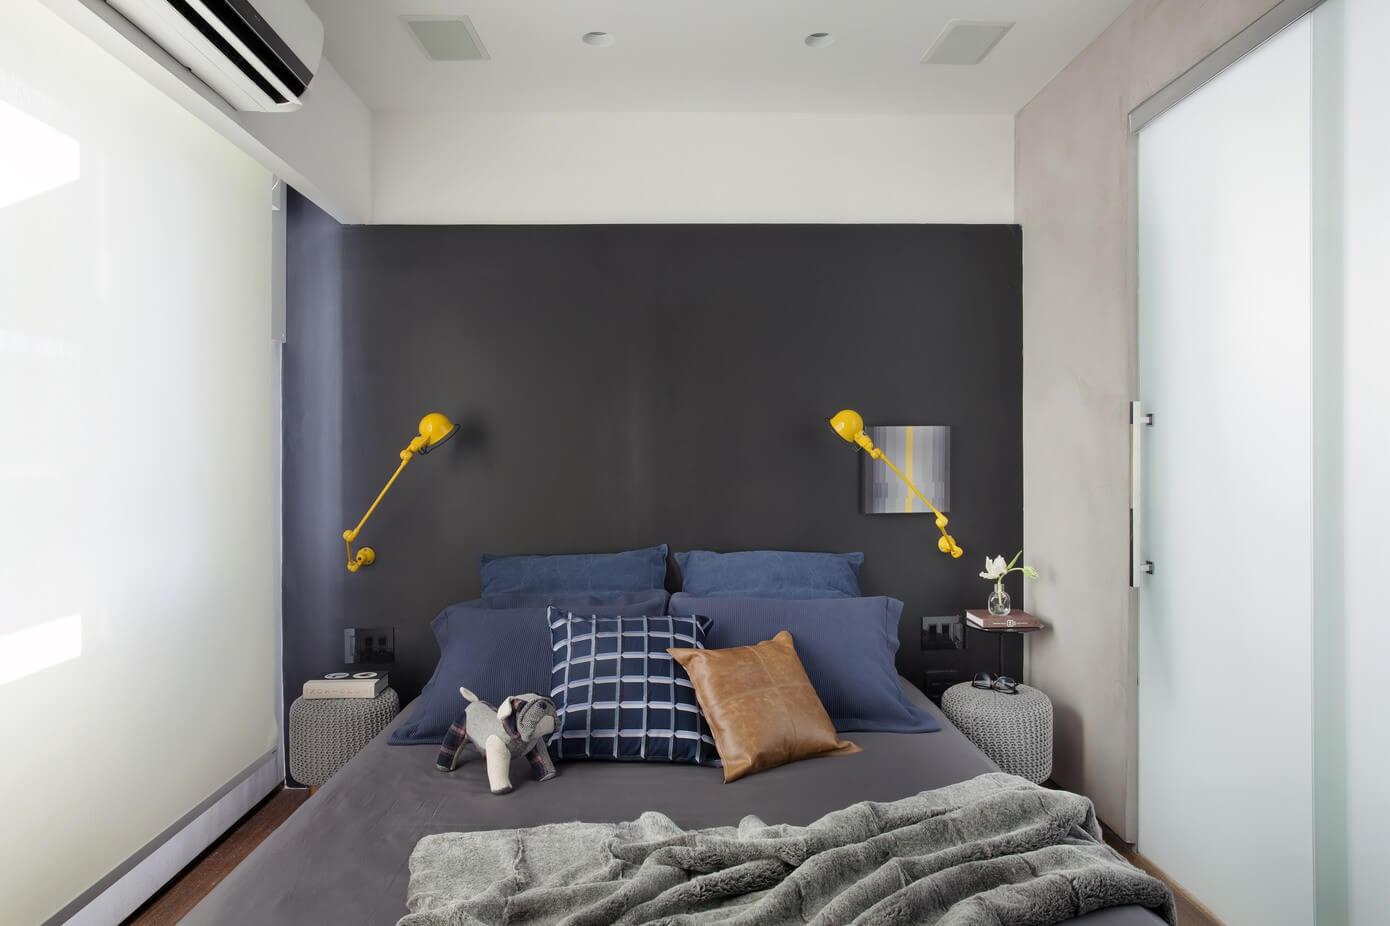 светъл и изчистен двустаен апартамент_roca_16